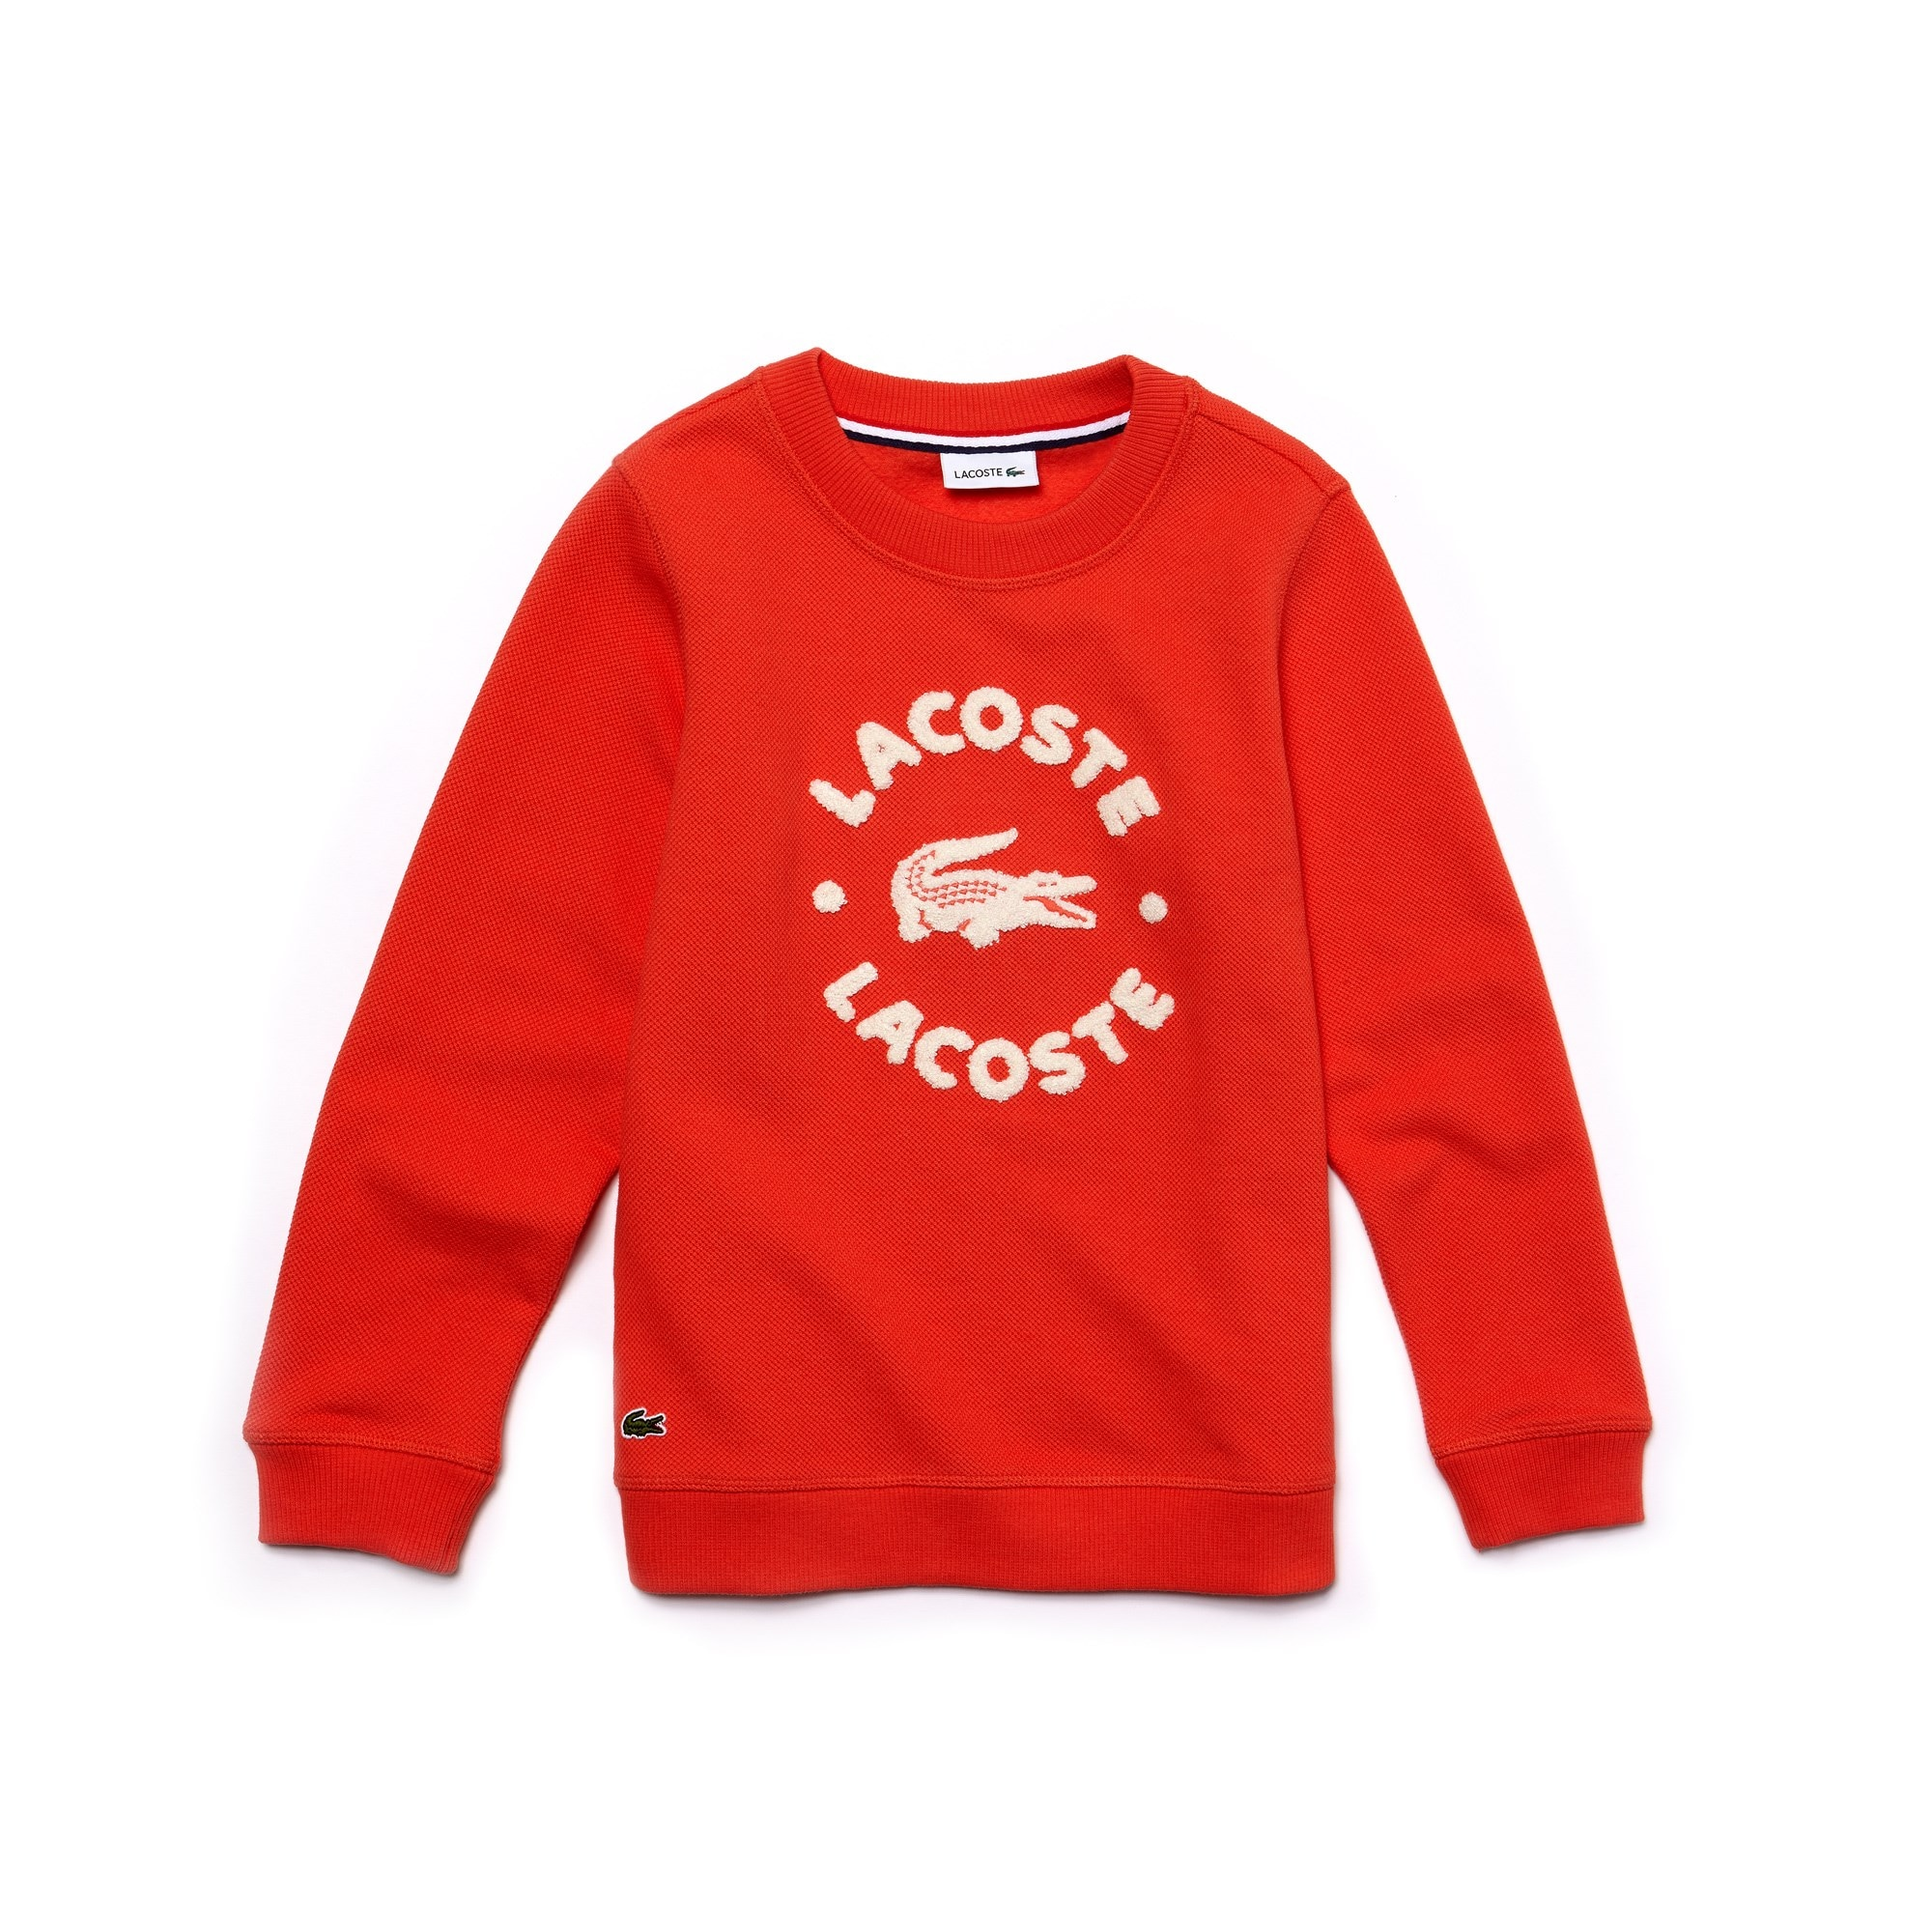 Boys' Crew Neck Lacoste Lettering Fleece Sweatshirt